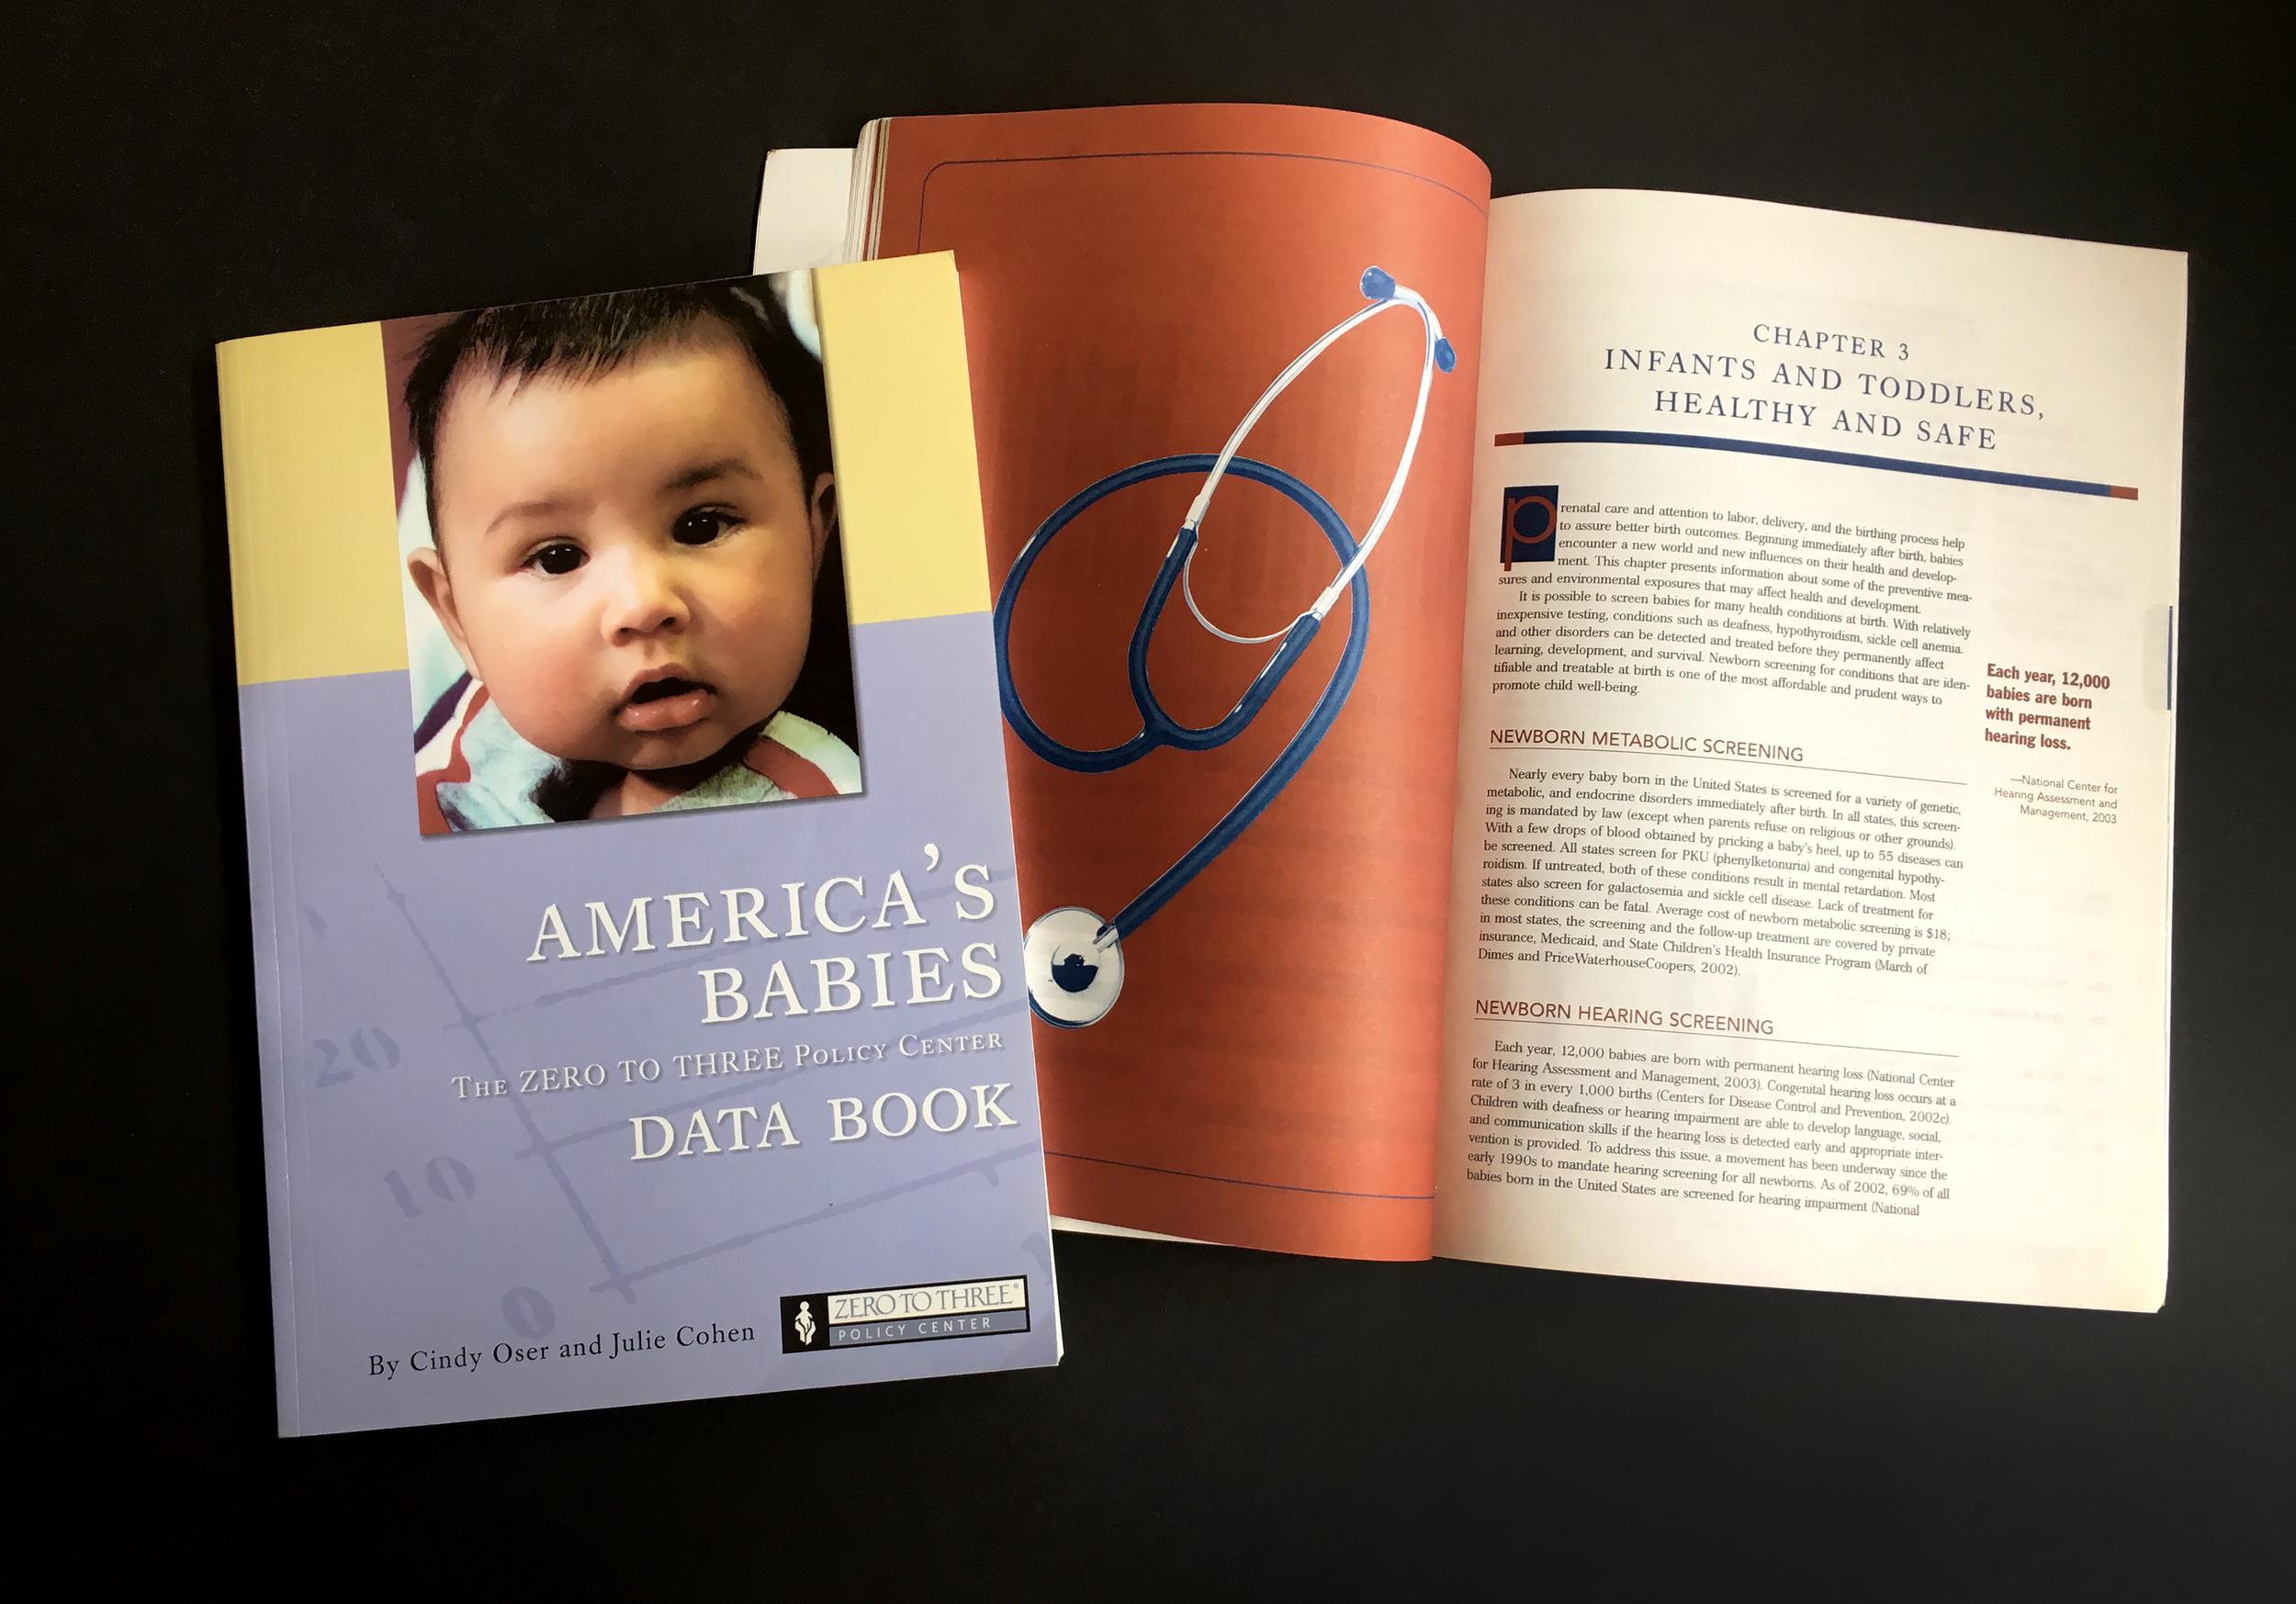 Zero To Threes data book on babies.